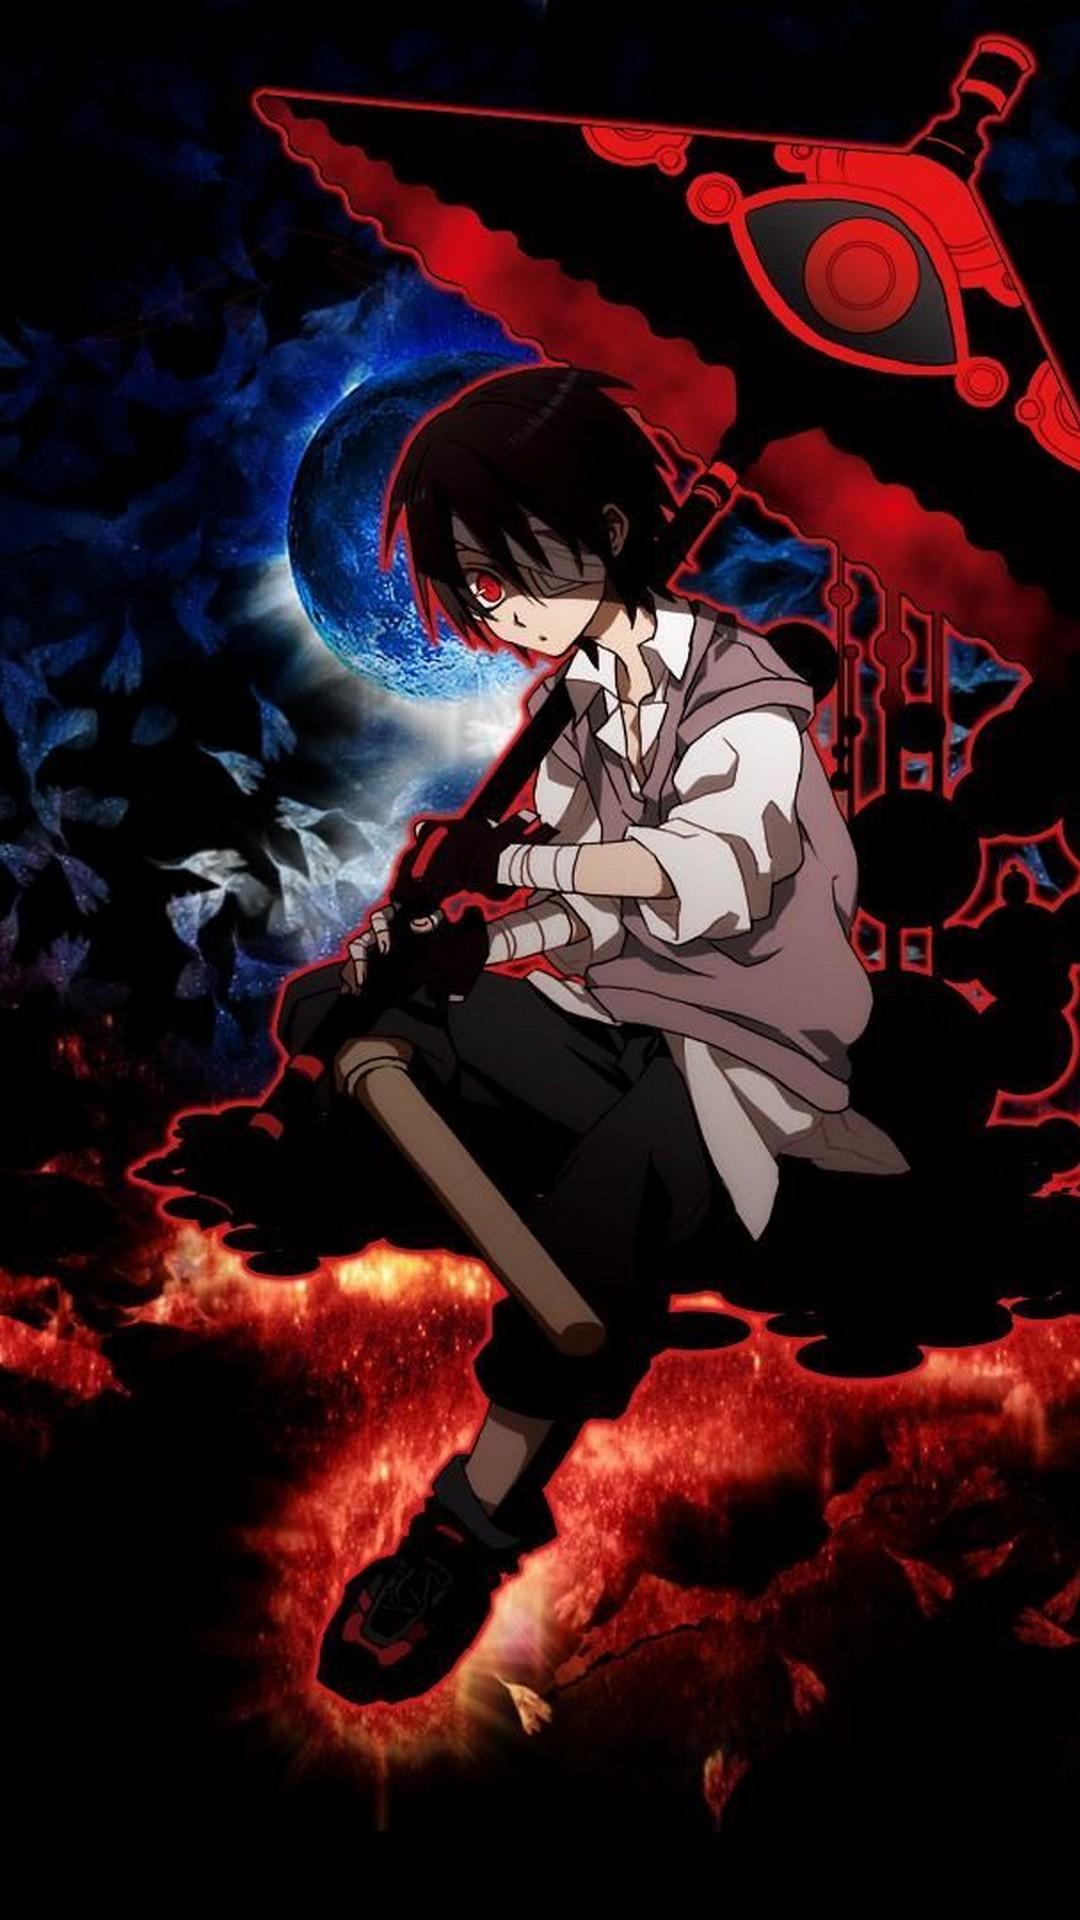 Red Sad Boy Anime